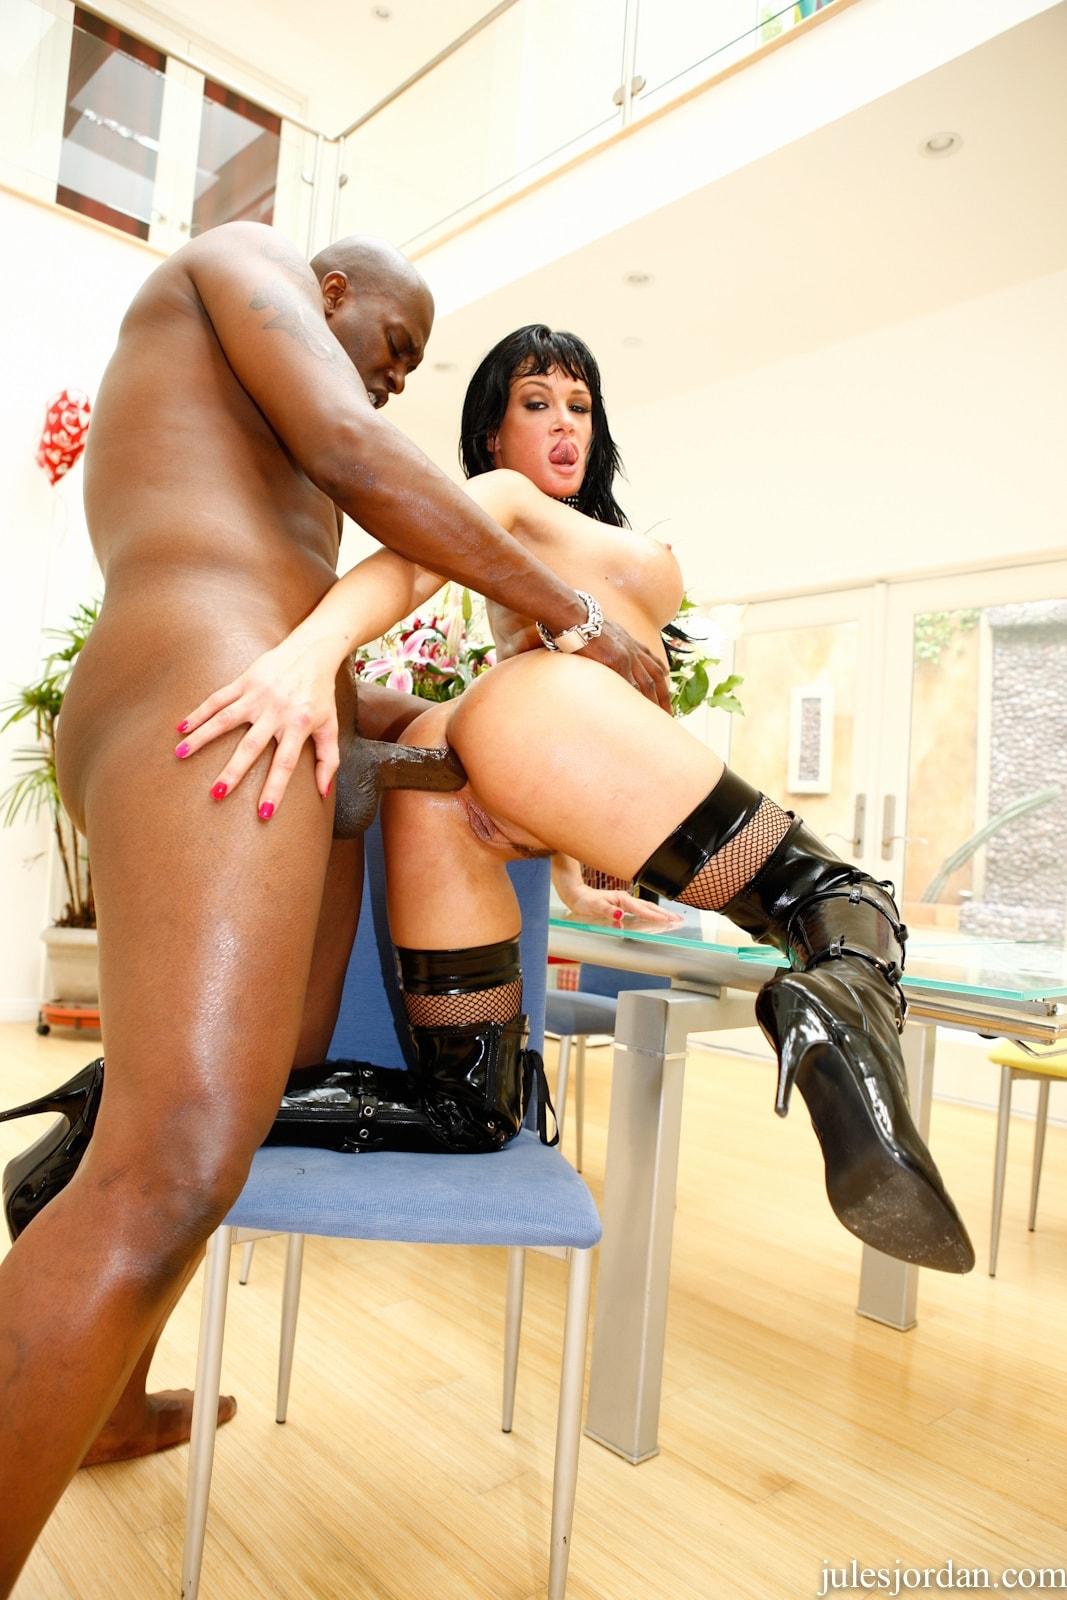 Tory lane interracial sex pornstar toes naked